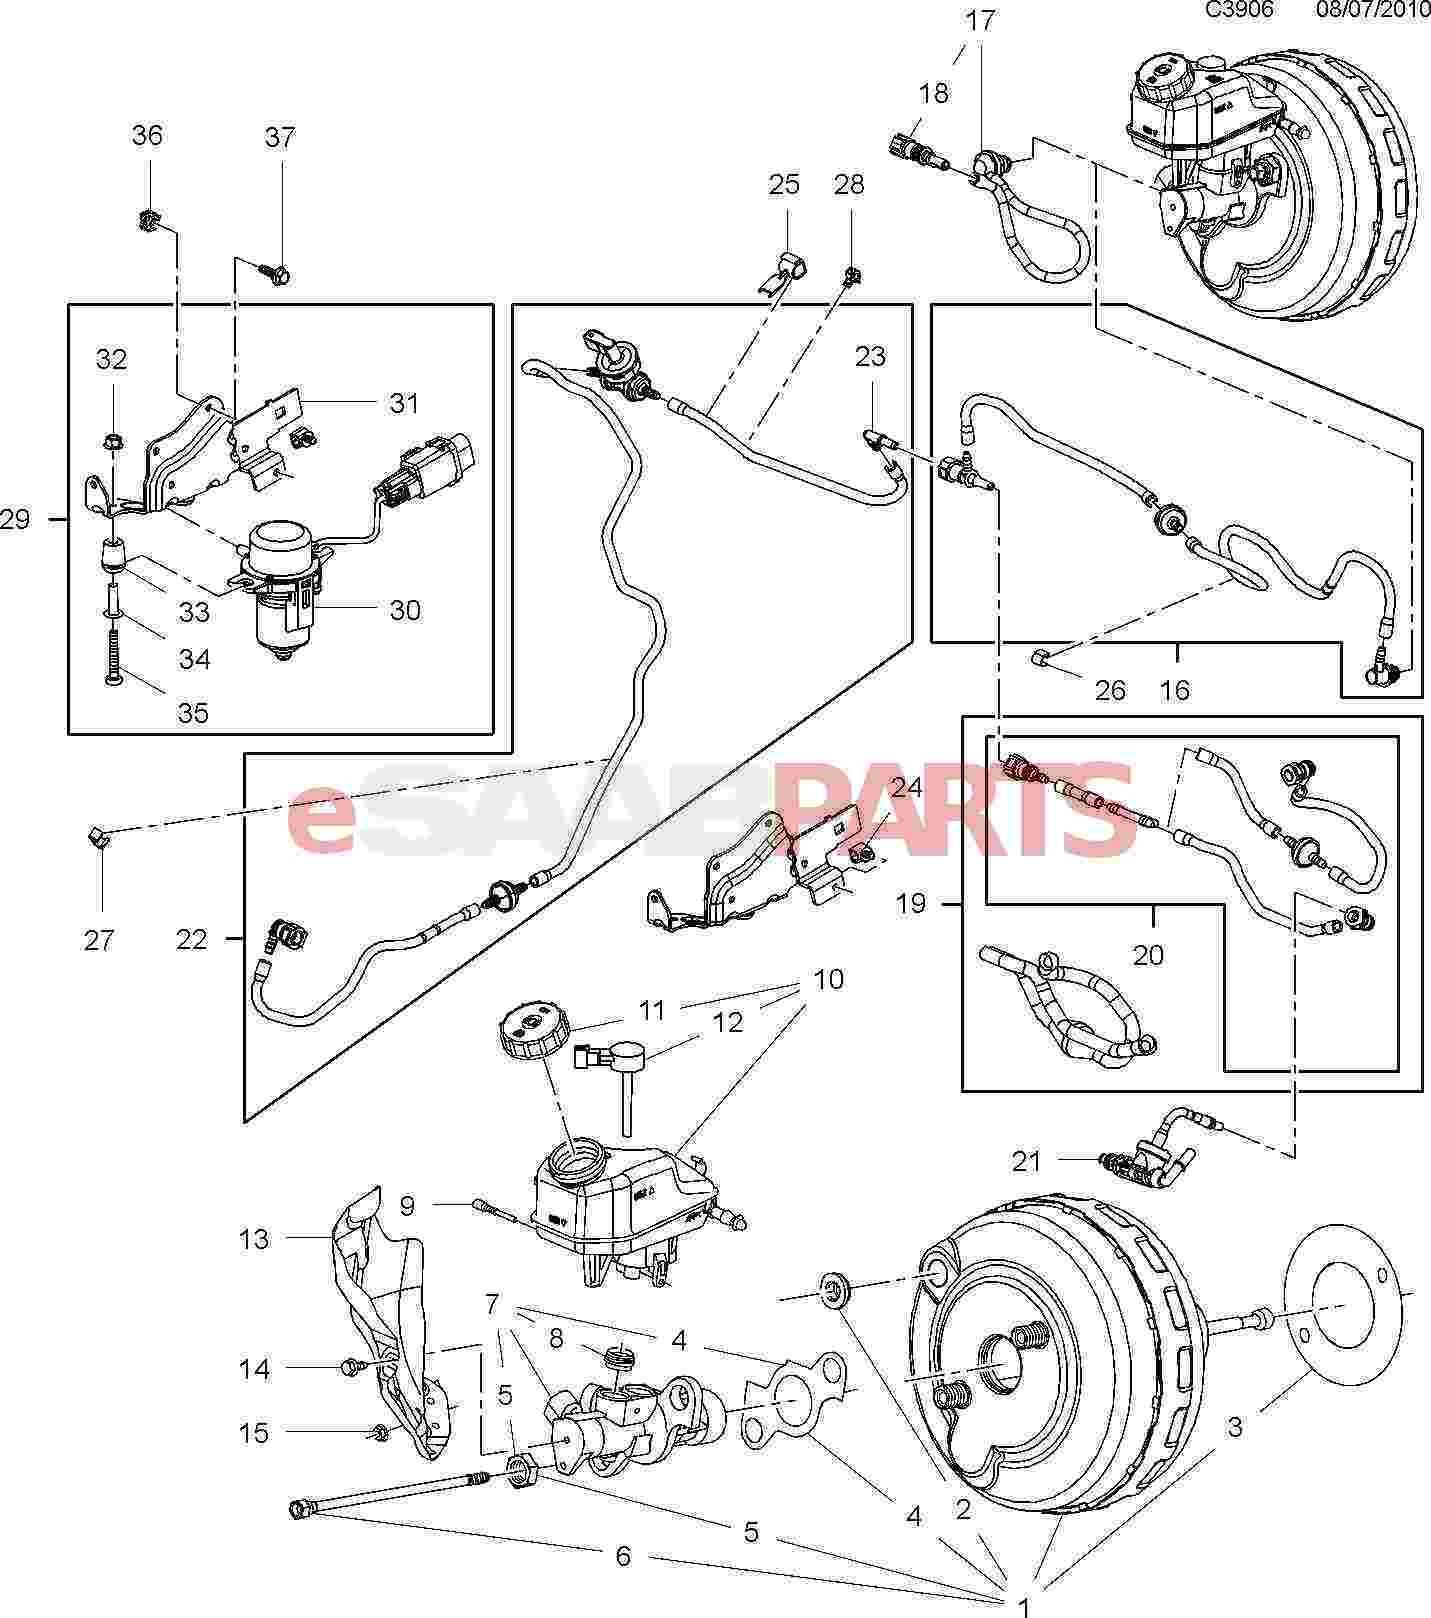 [55556698] SAAB Brake Vacuum Hose Pipe (Rear of Intake